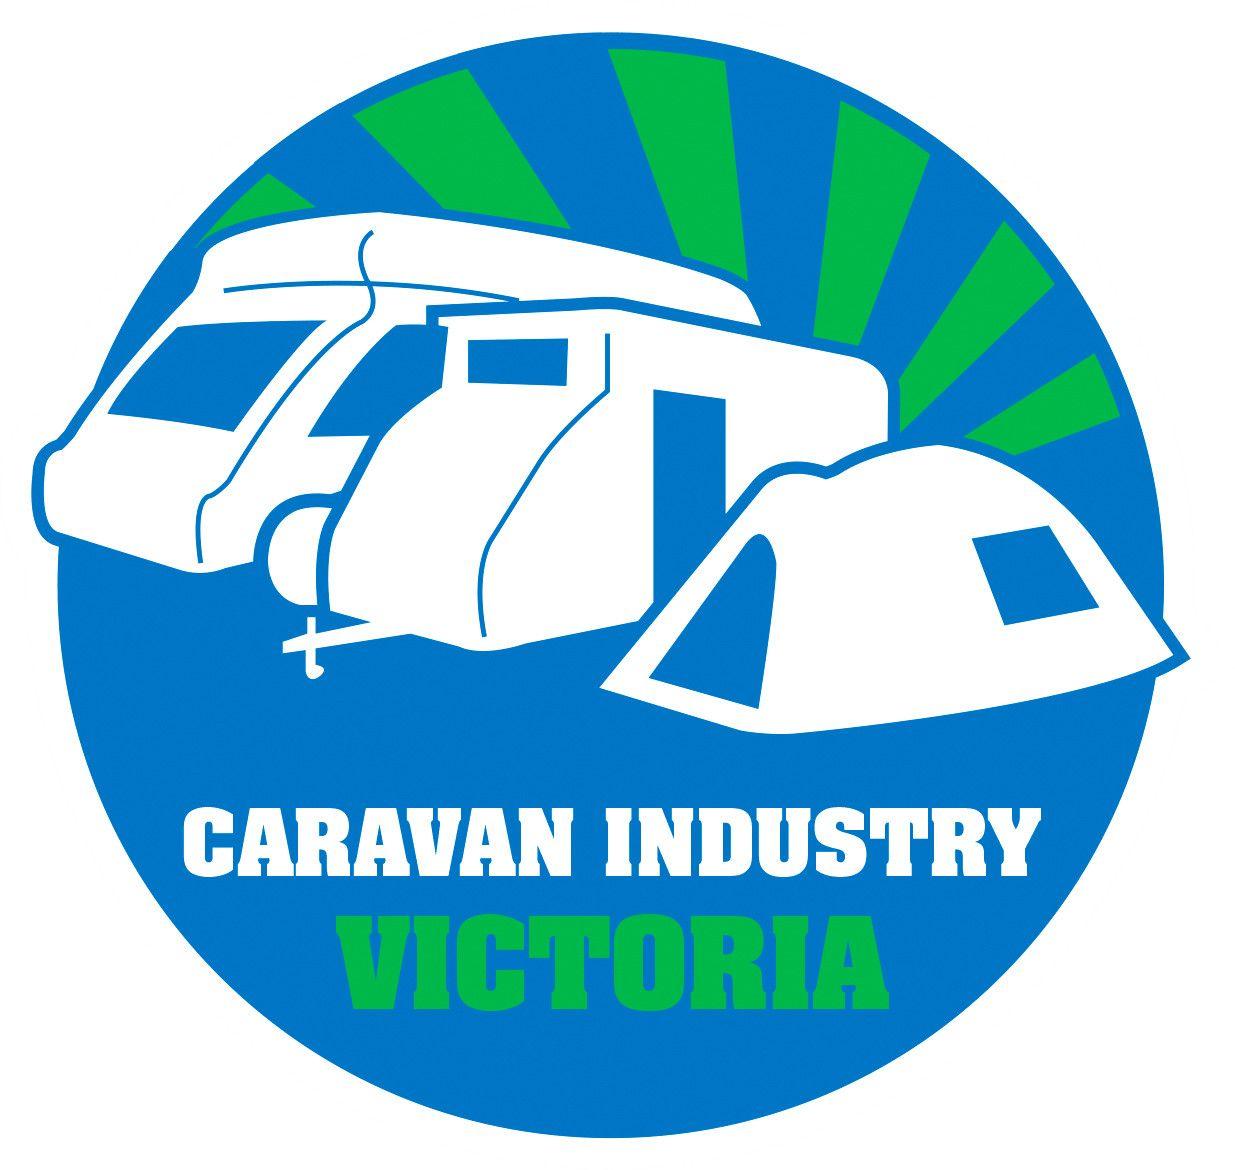 Caravans, Motorhomes and RVs For Sale - Caravan Camping Classifieds